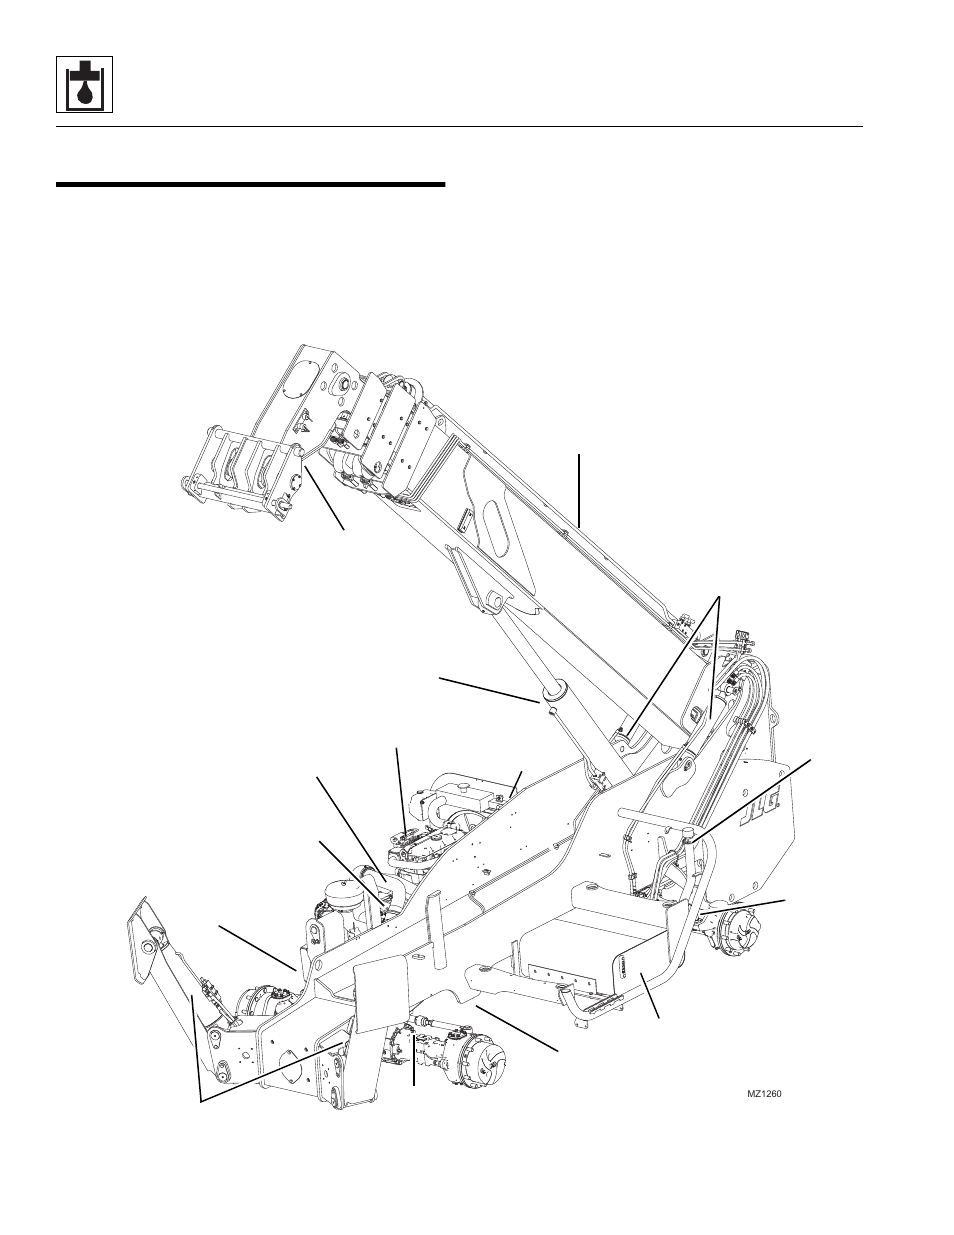 hight resolution of jlg cm2023 wiring diagram wiring diagram h8jlg cm2023 wiring diagram wiring diagram z4 jlg cm2023 wiring